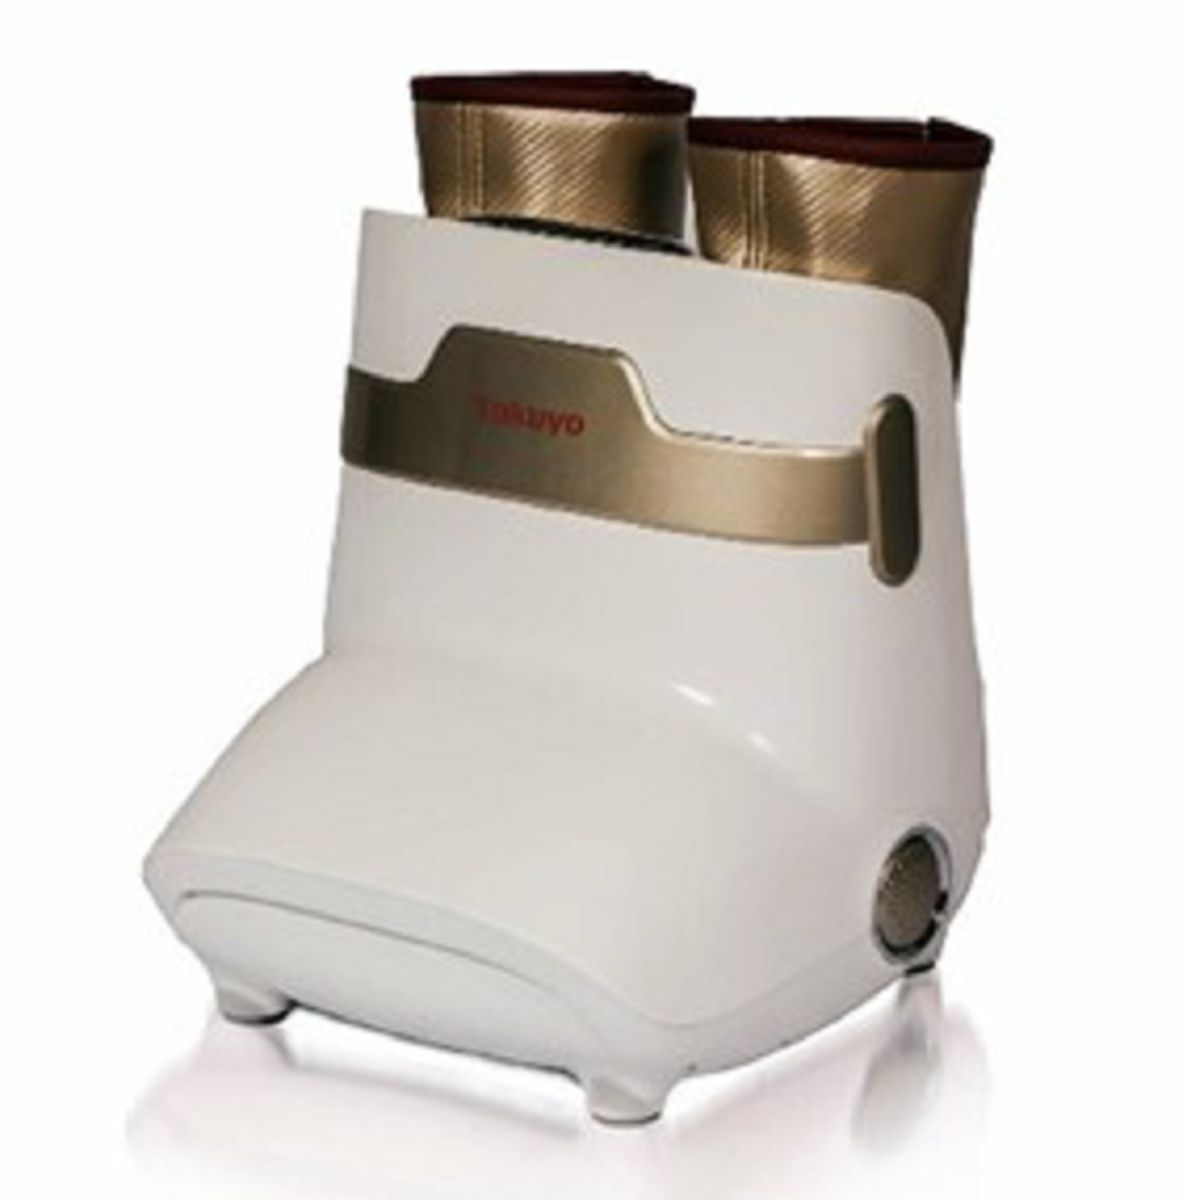 Tokuyo Leg Boots Massage